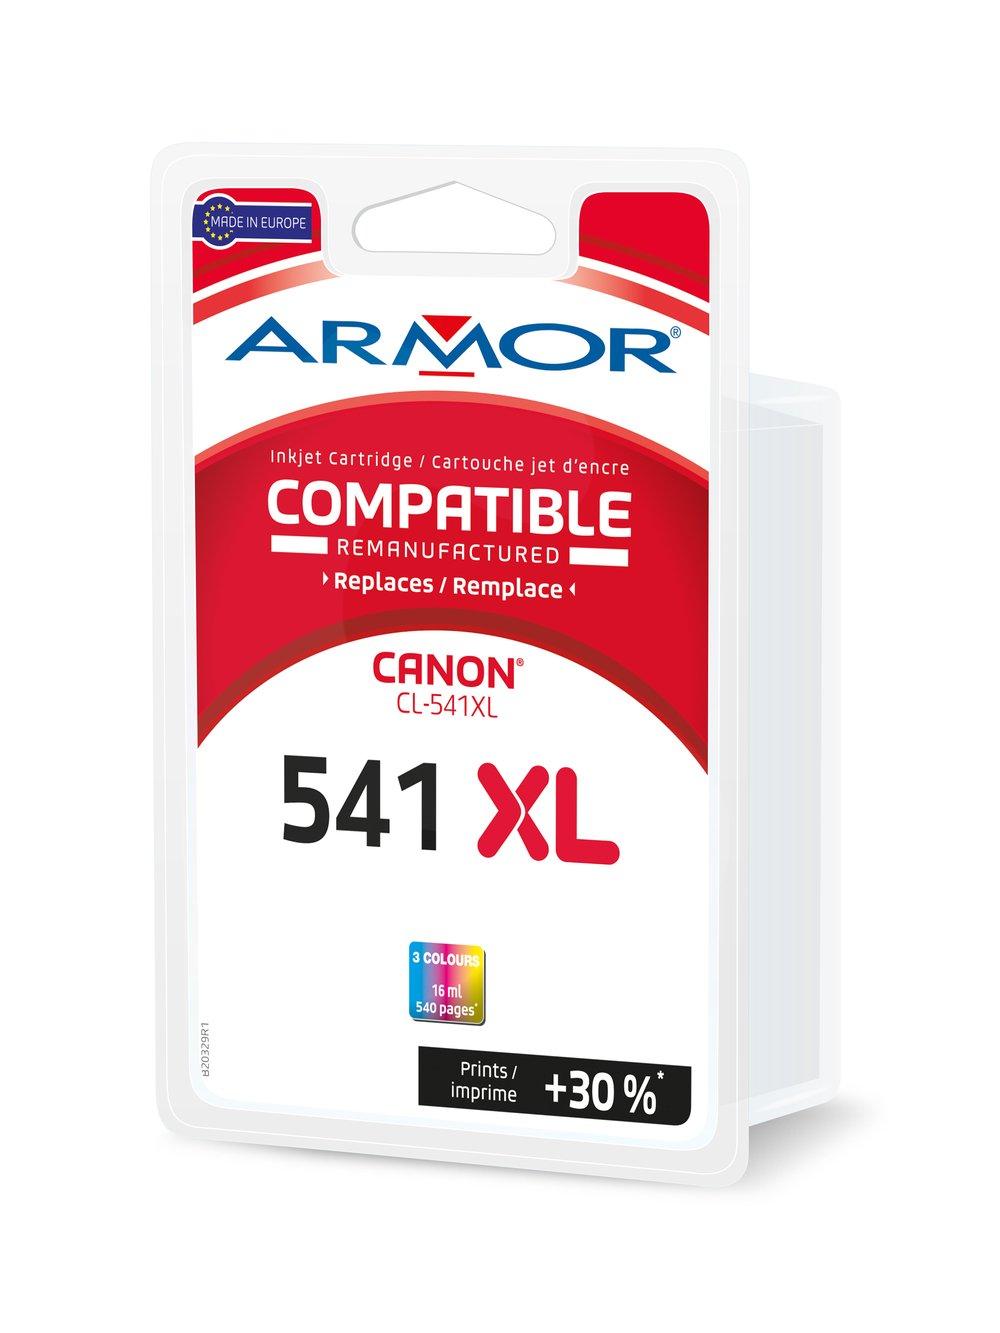 Armor b20329r1 equivalente a Canon CL-541 X L - para Canon Pixma ...